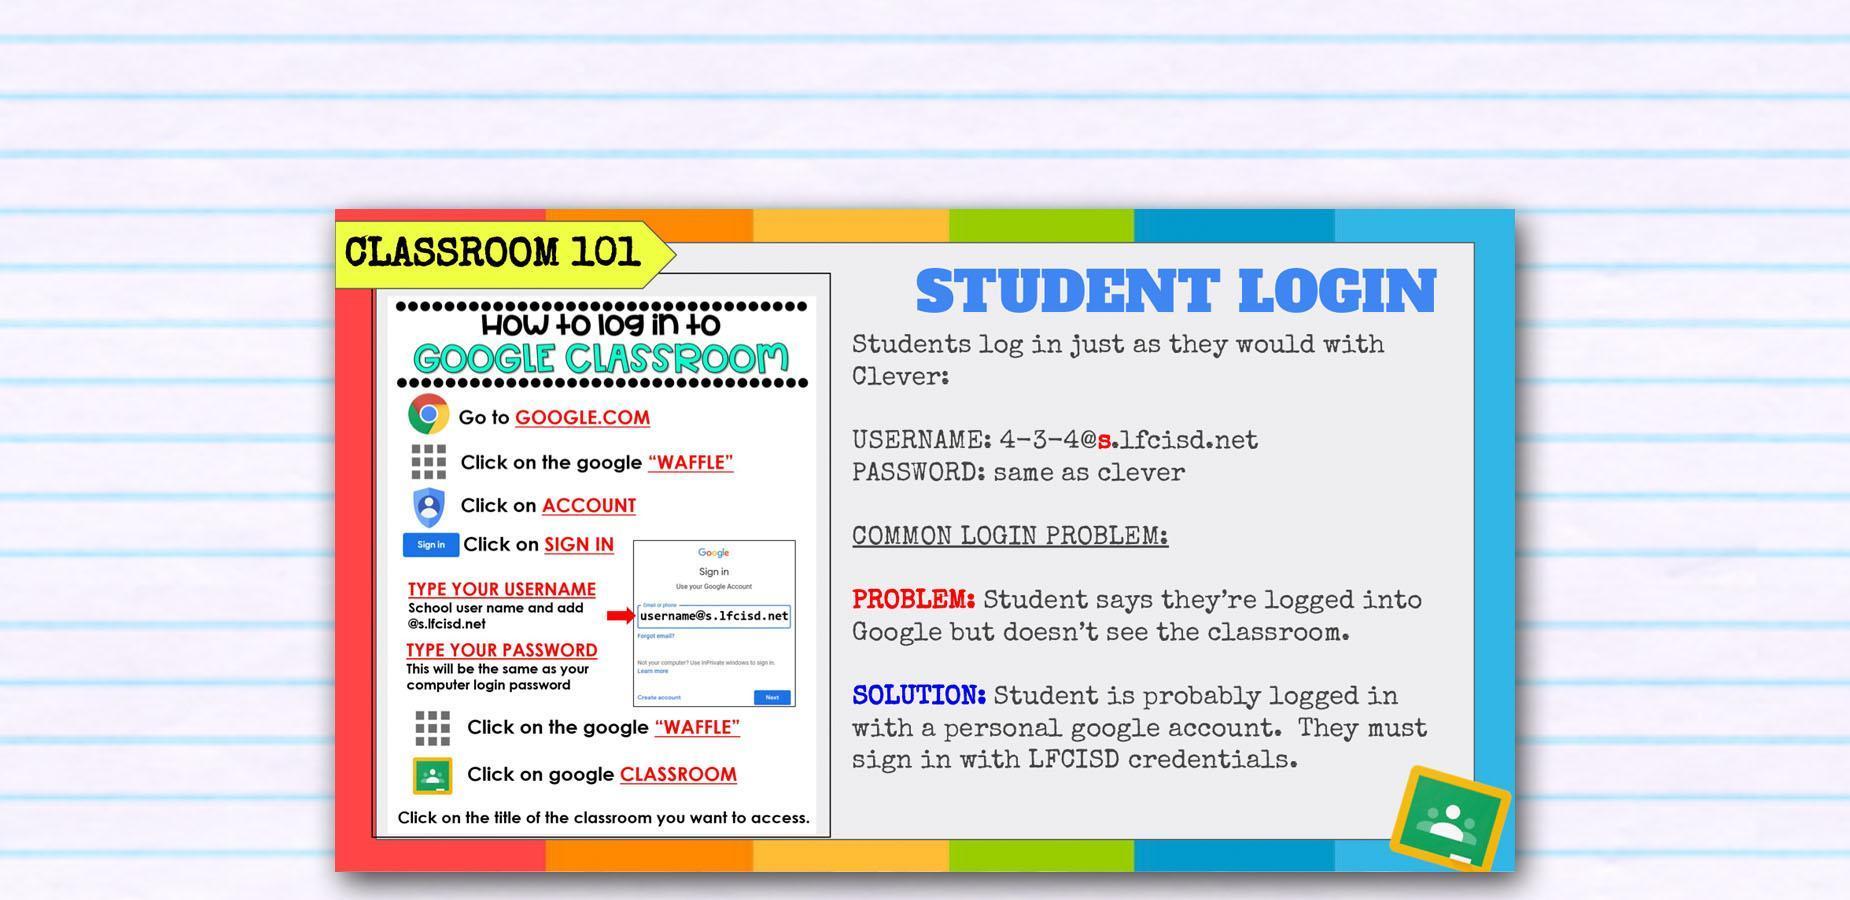 Google Classroom 101 Banner